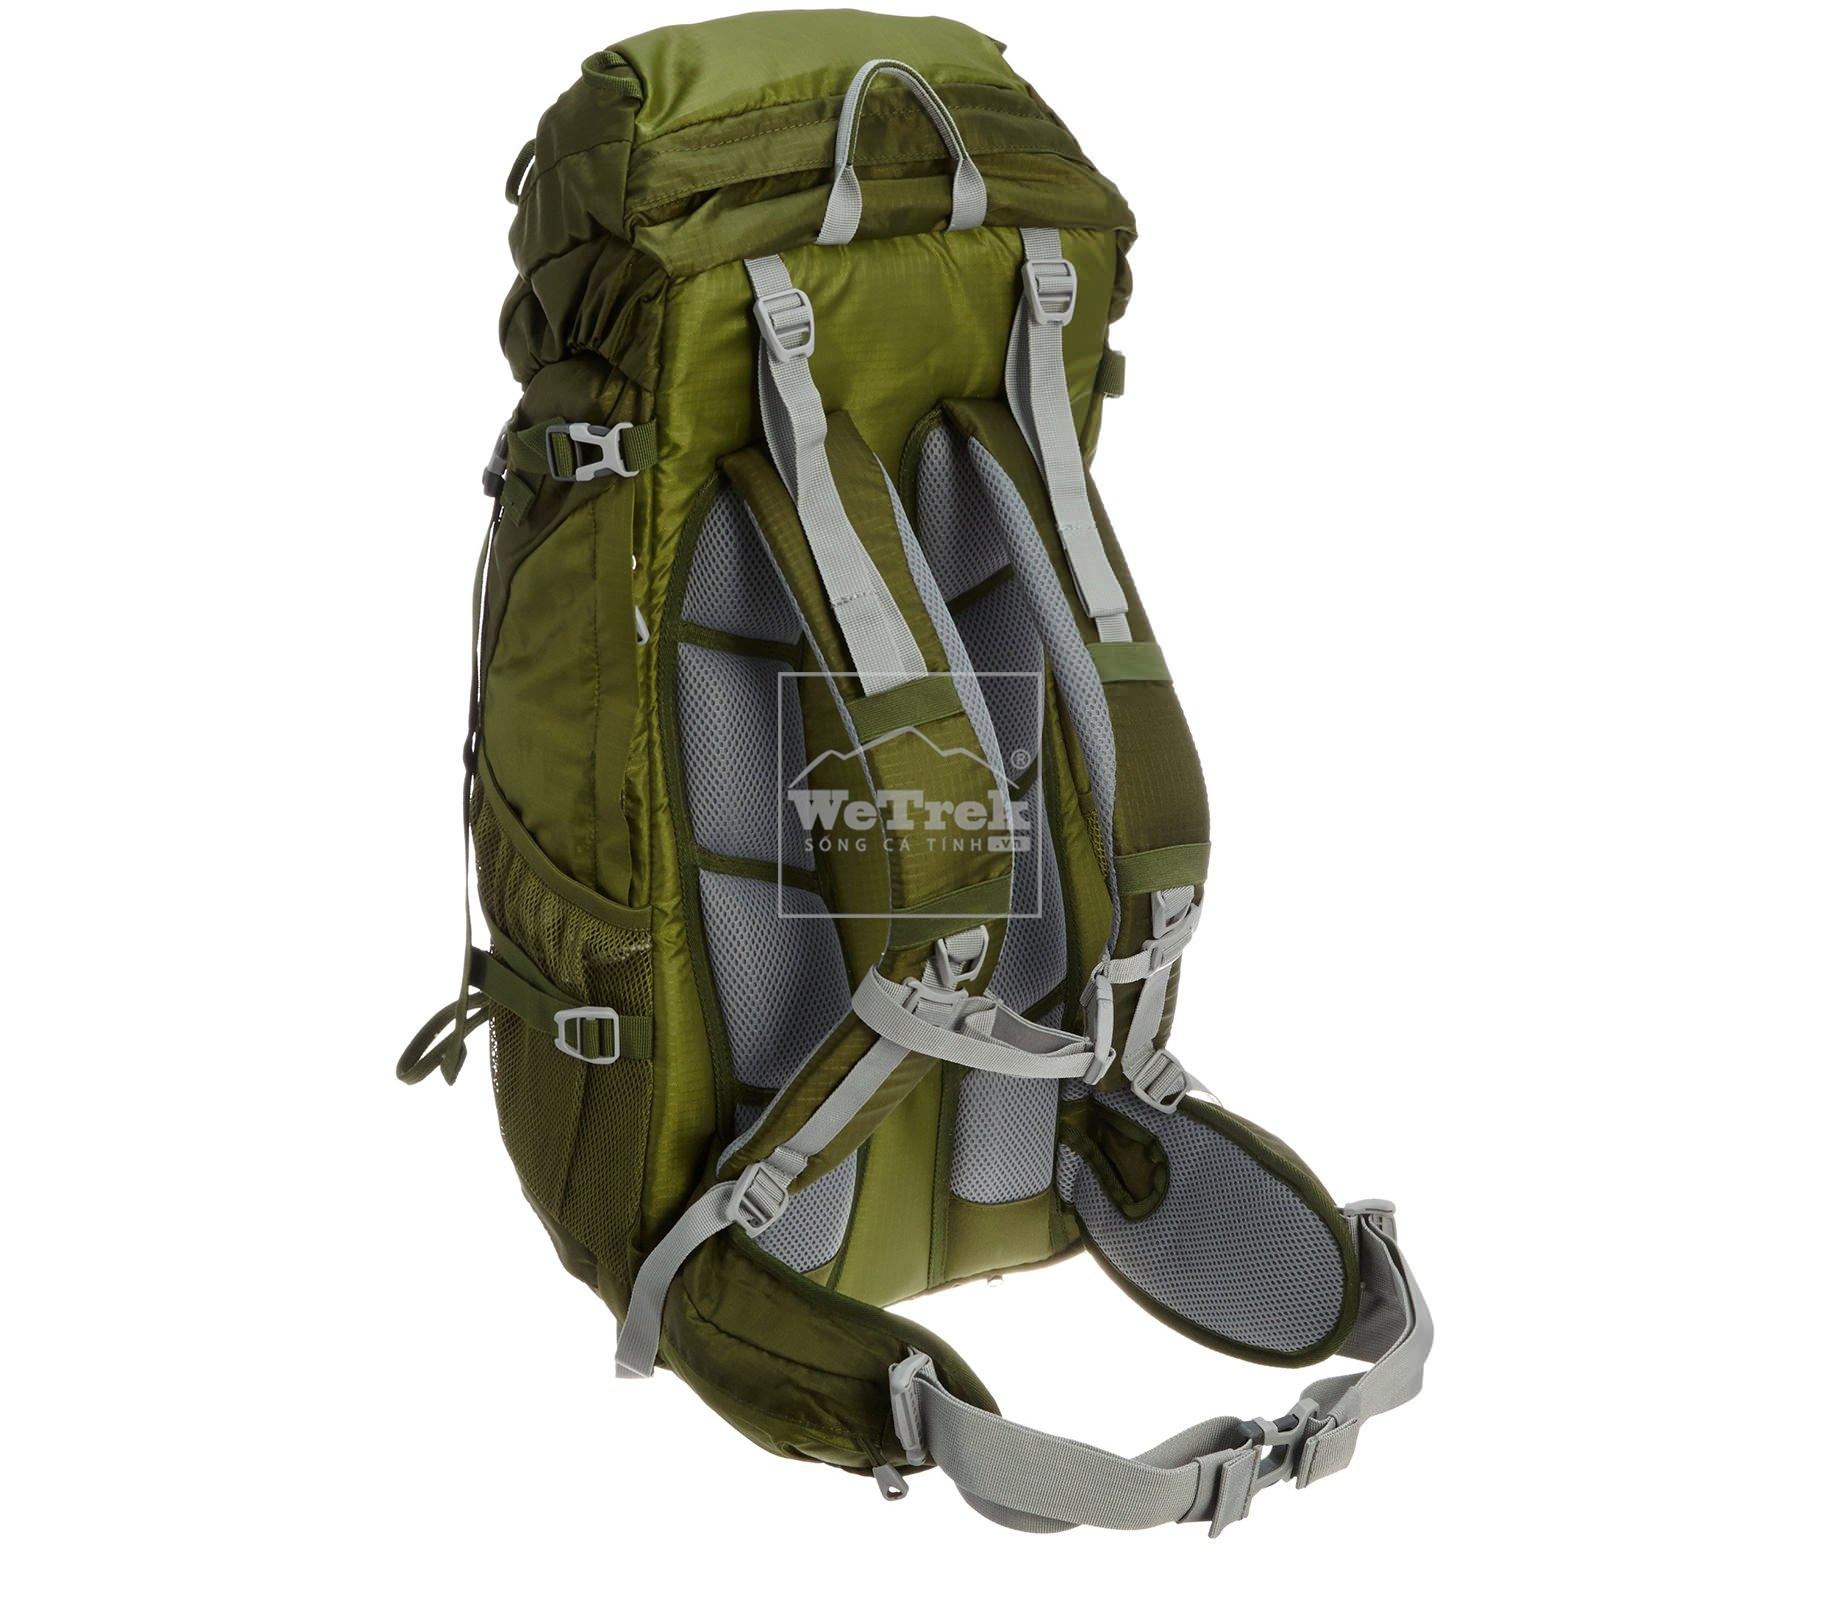 ba-lo-leo-nui-40l-coleman-mttrek-lite-backpack-green-cbb4091gr-7455-wetrek.vn-1